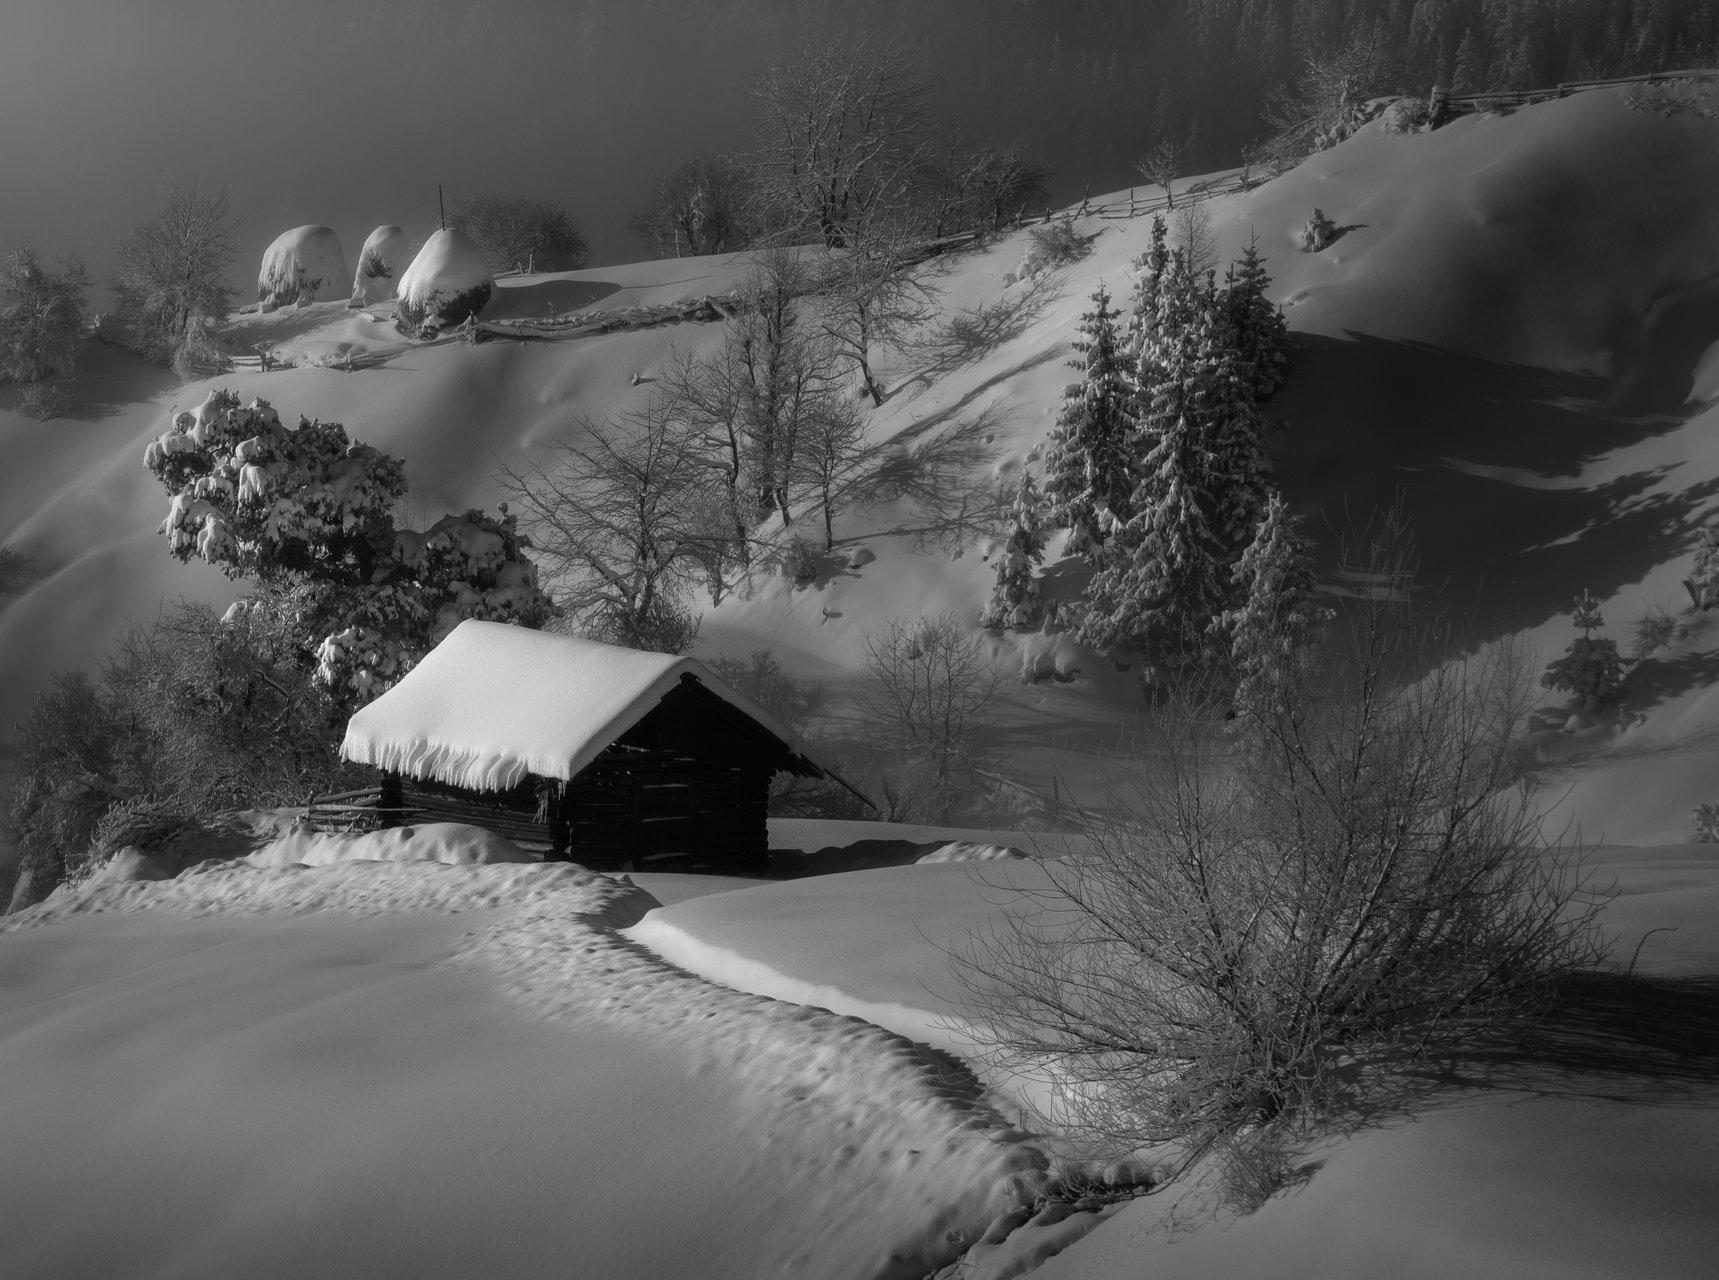 Родопа планина от Miroslav Mominski - Miroslav_Mominski